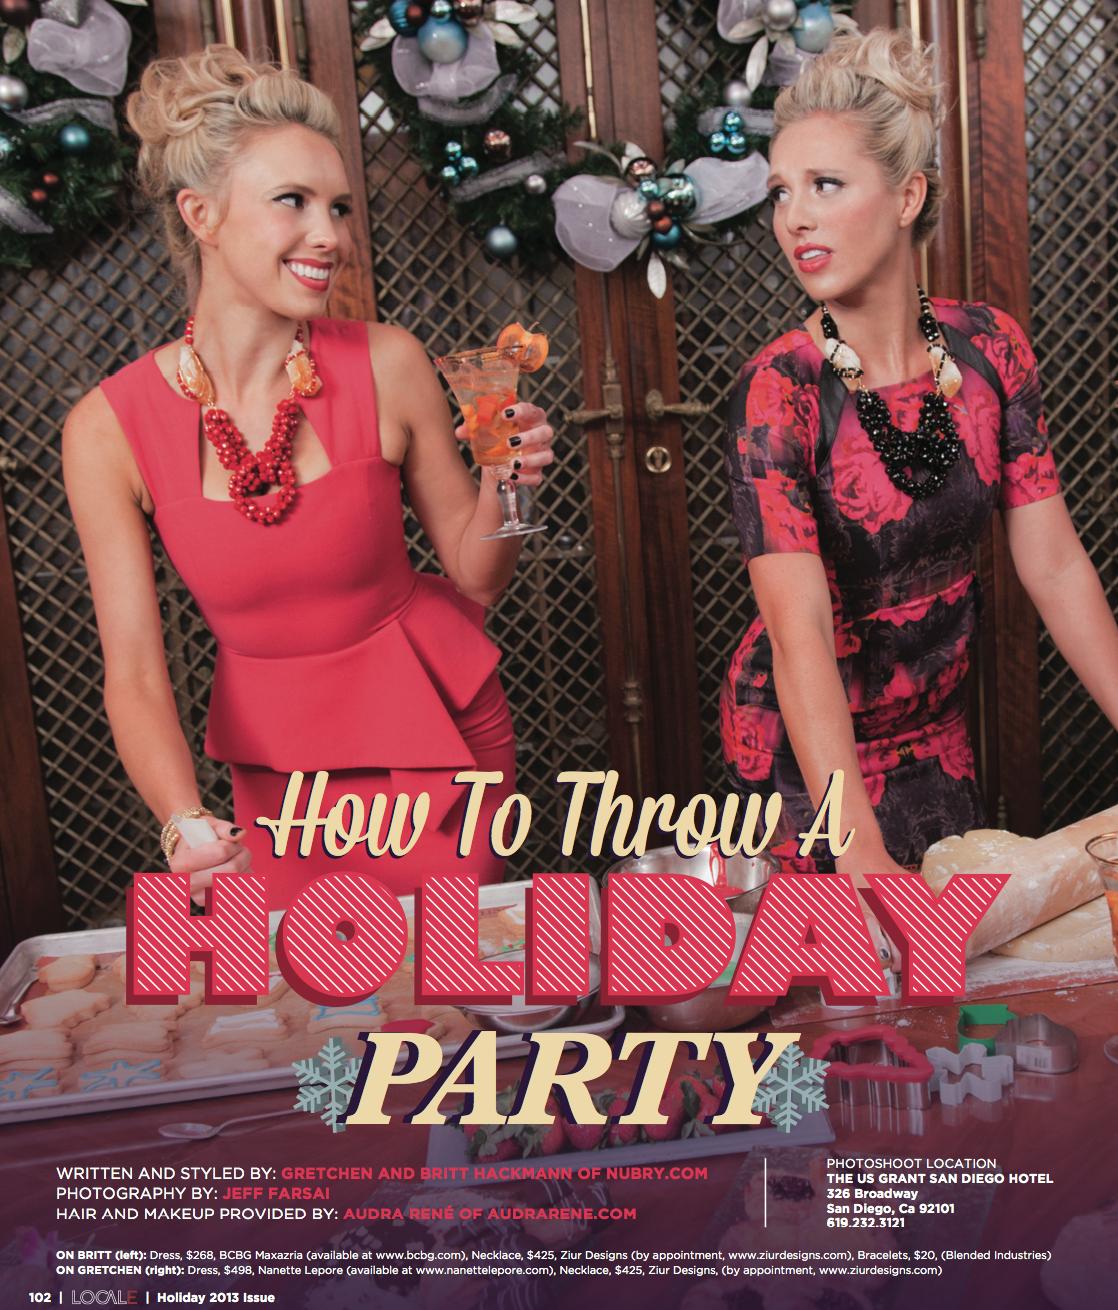 How To Throw A Holiday Party Nubry Locale Magazine San Diego Britt Hackmann Gretchen Hackmann